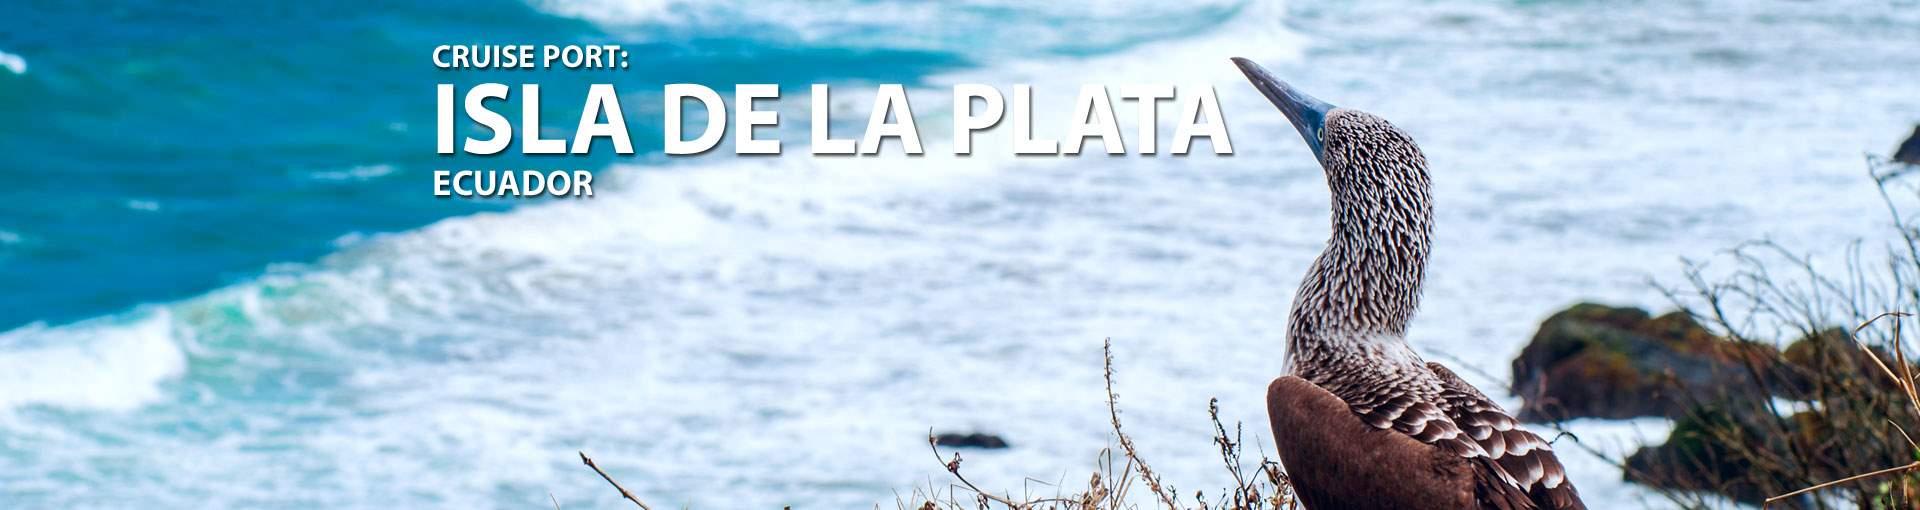 Cruises to Isla De La Plata, Ecuador